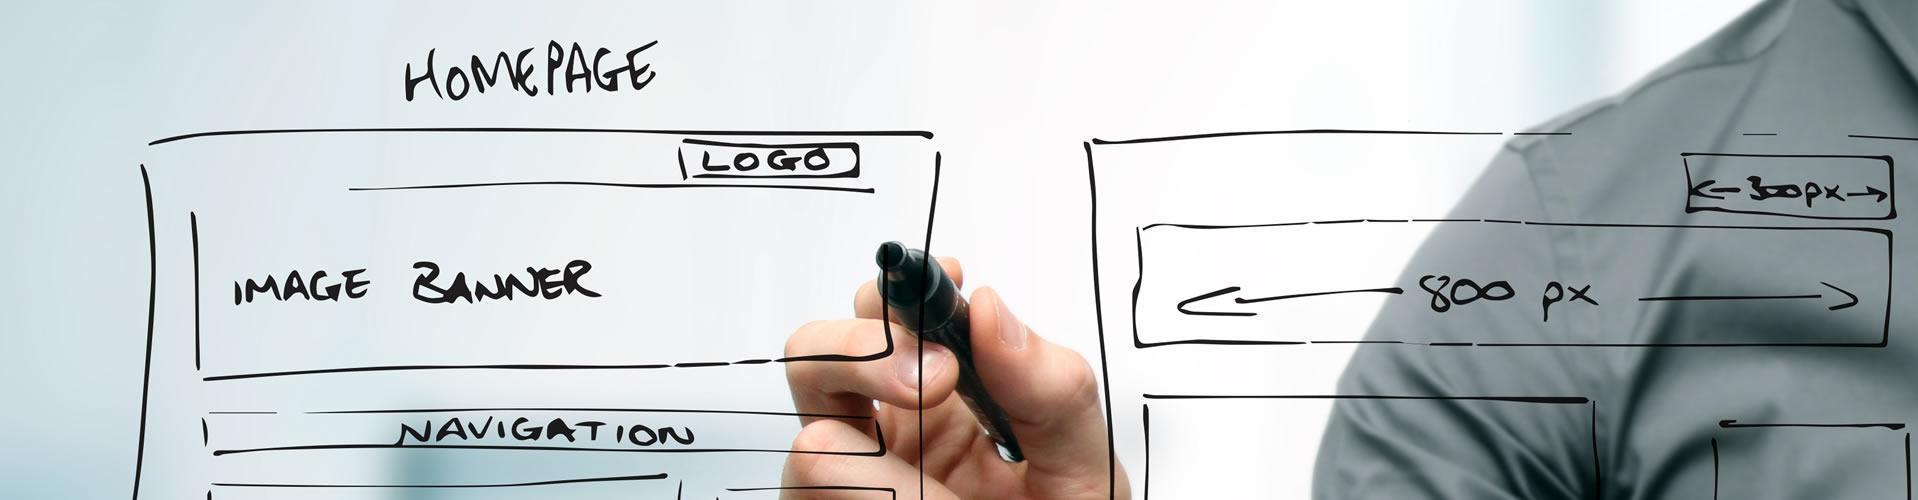 Webdesign in Beilen (drenthe)